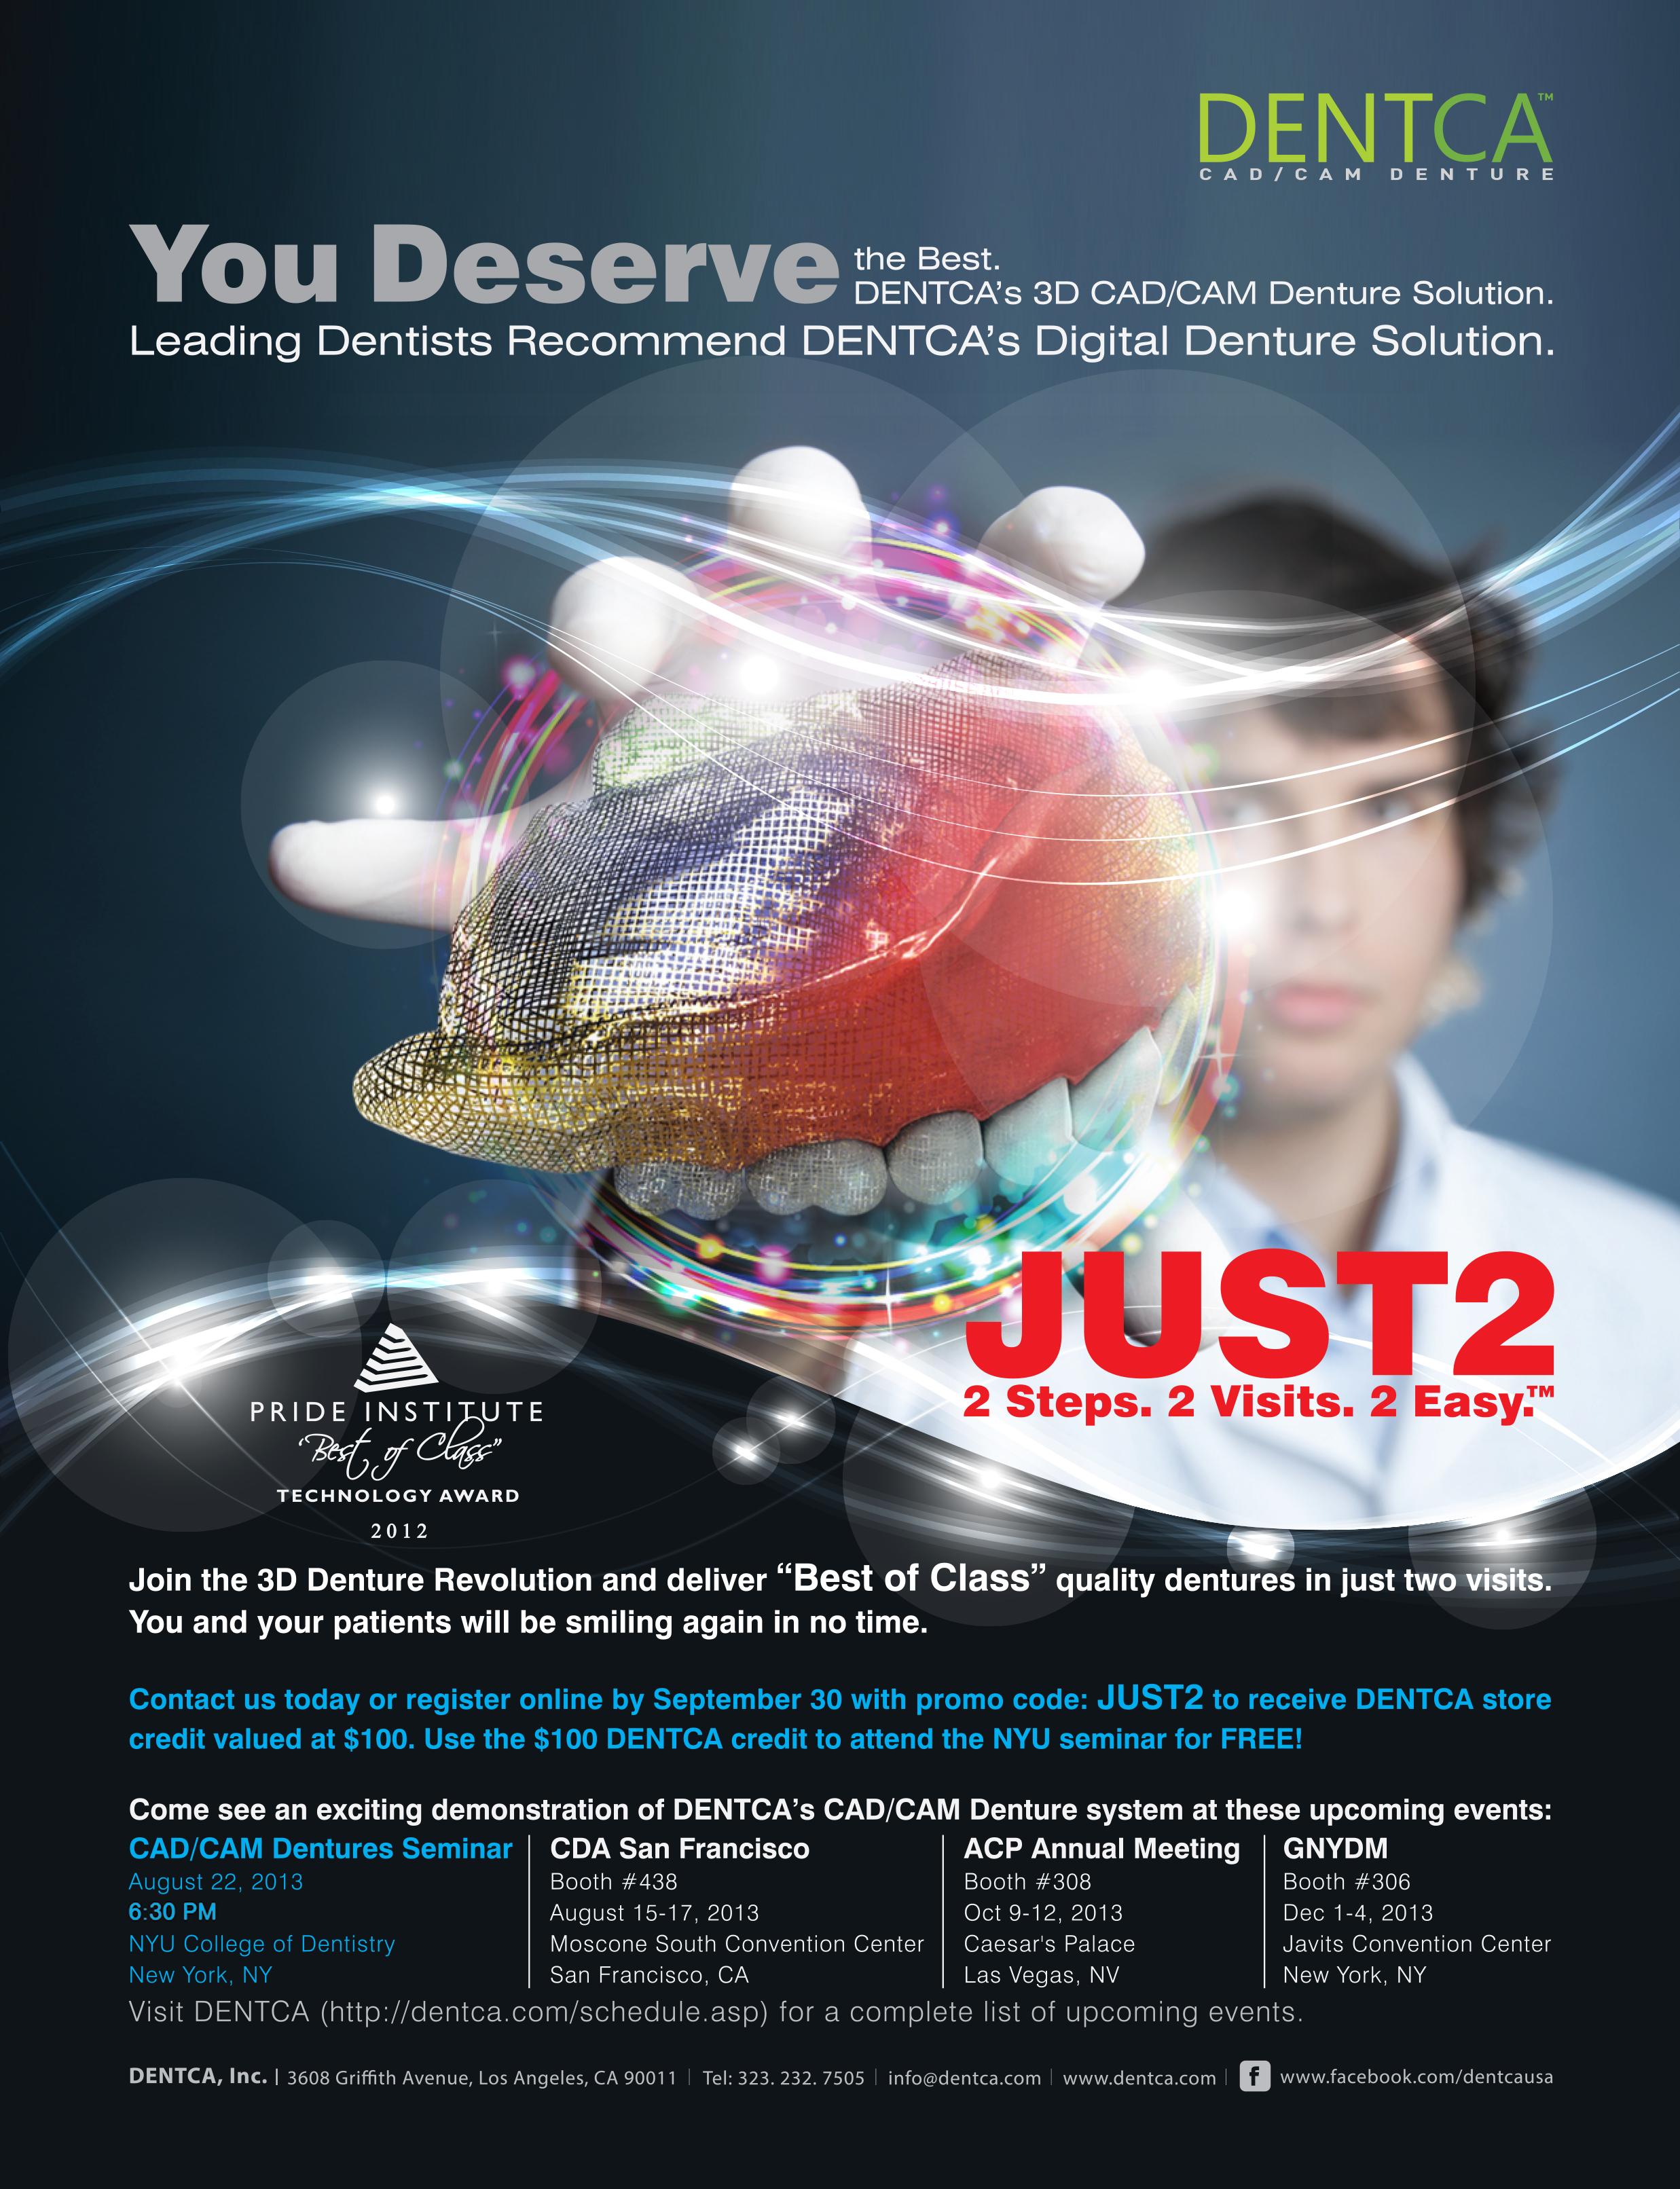 New York University College of Dentistry Hosting DENTCA CAD